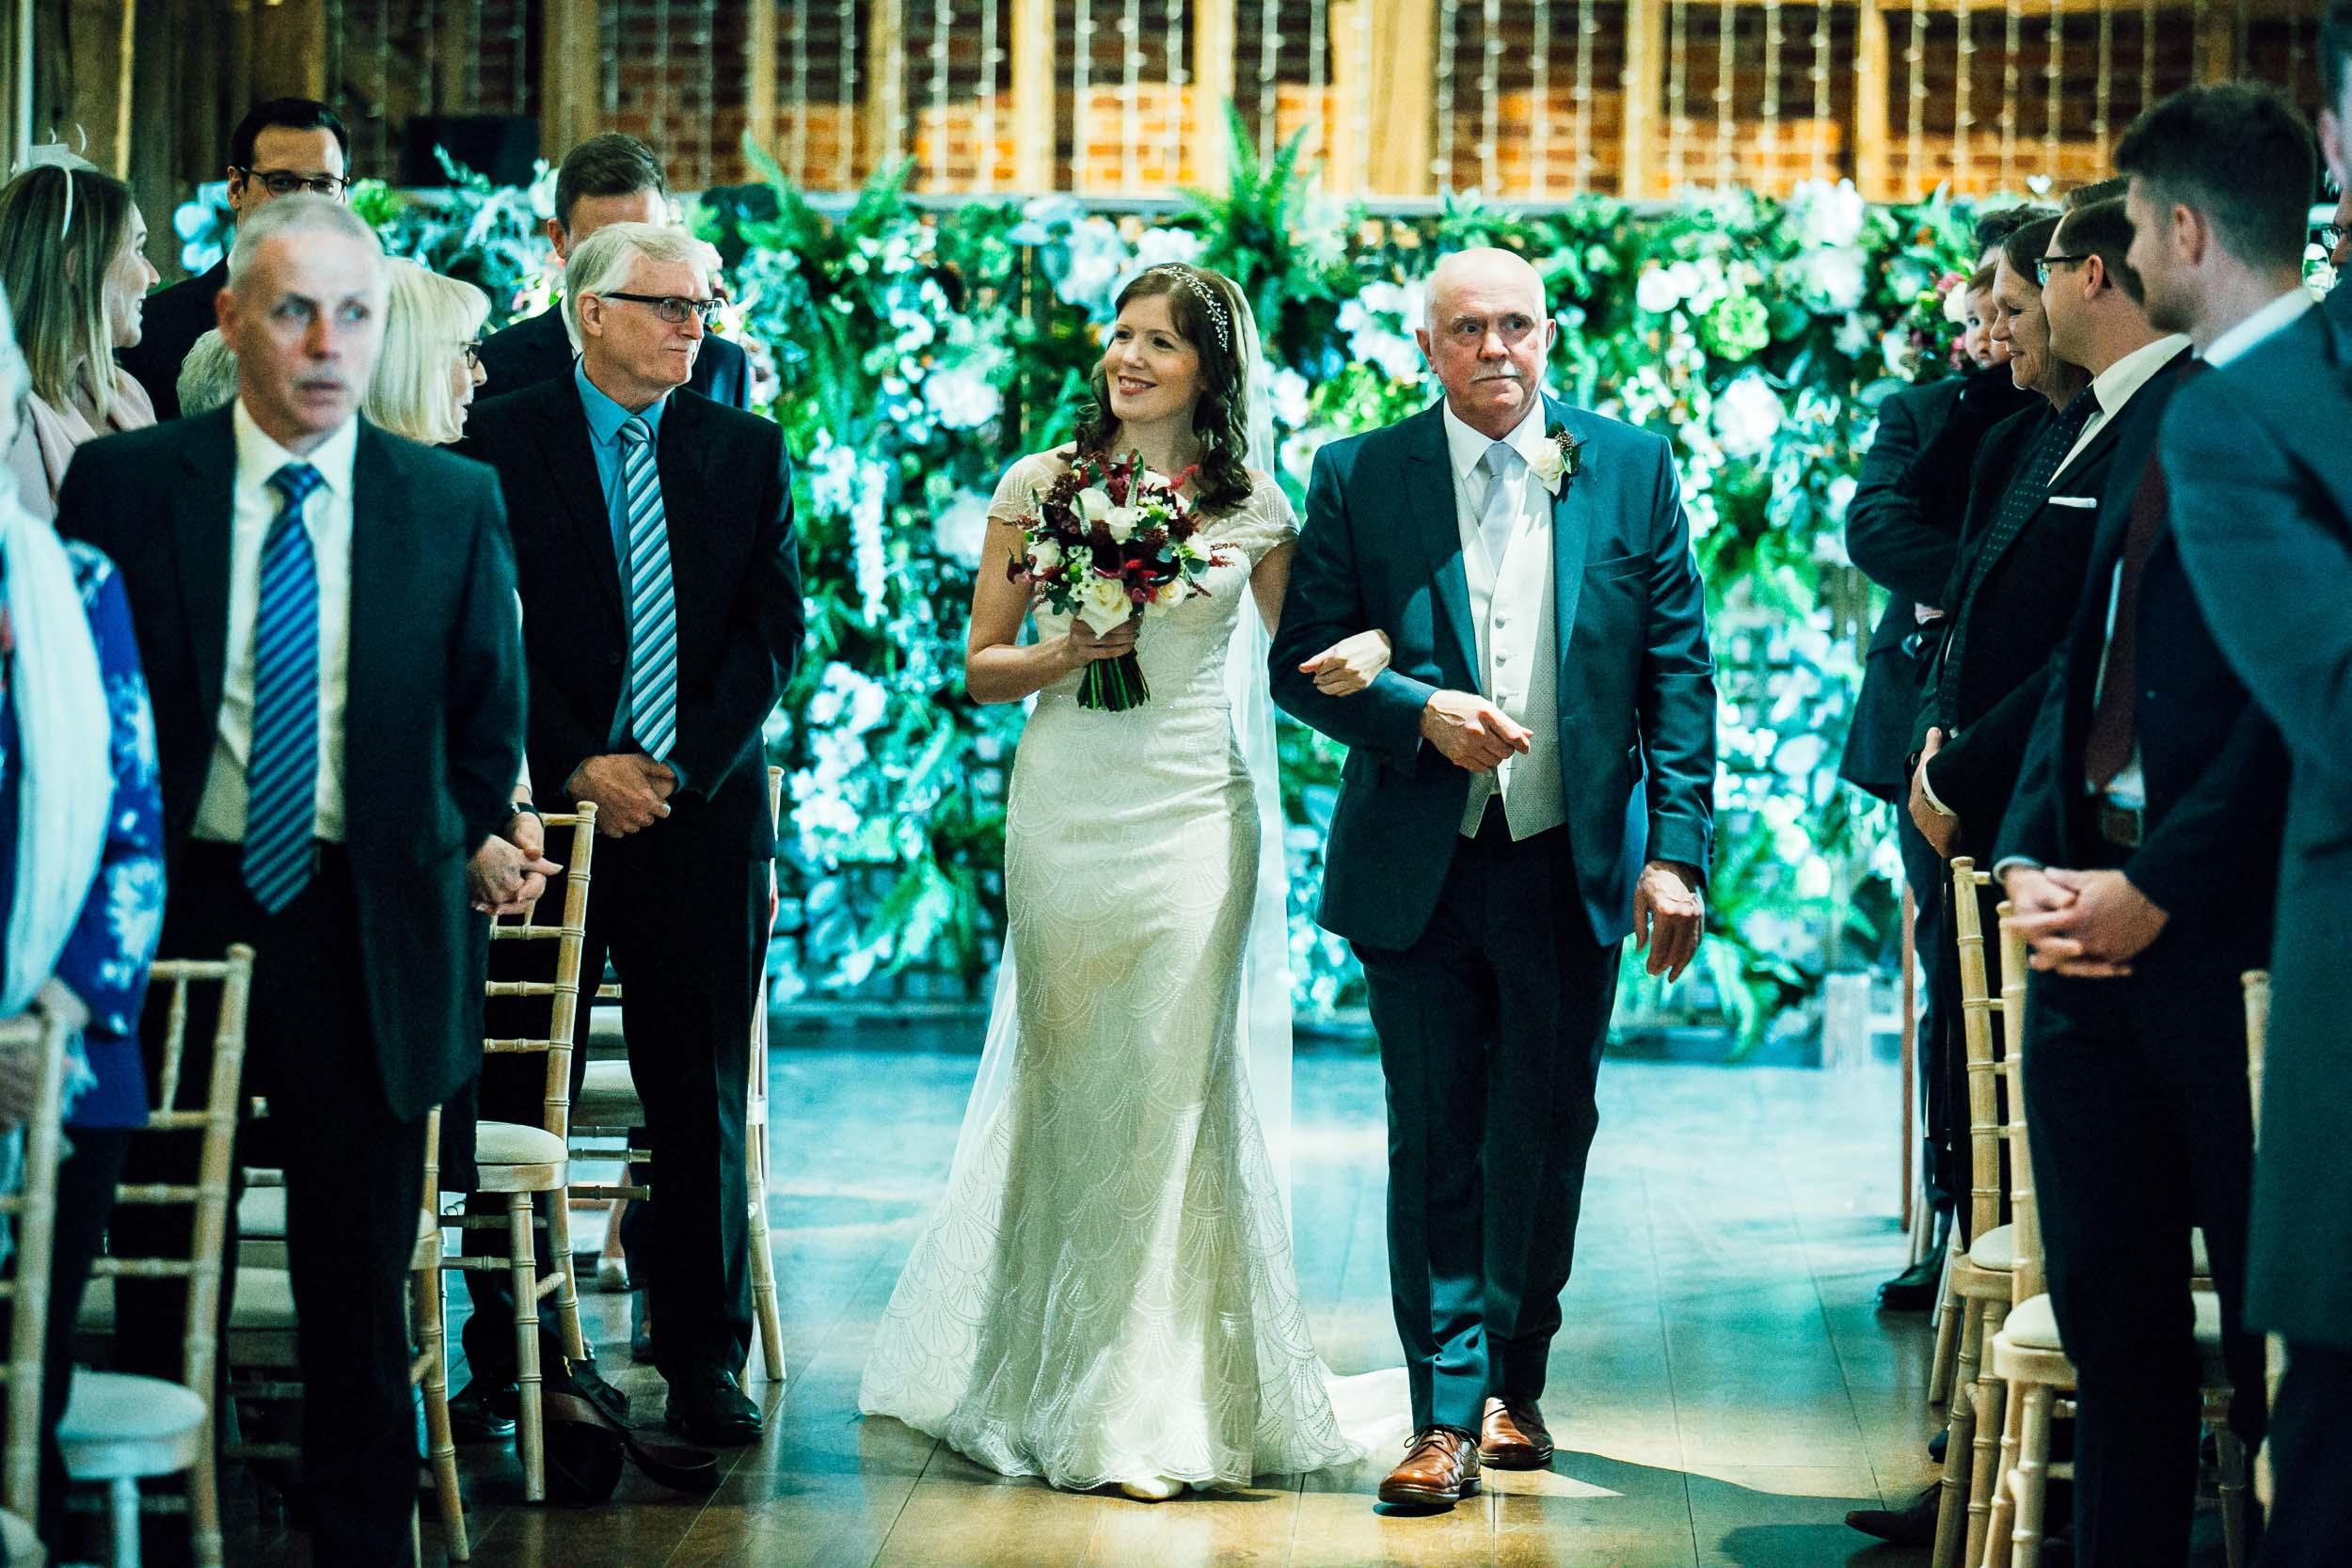 micklefield-hall-wedding-photographer 023.jpg